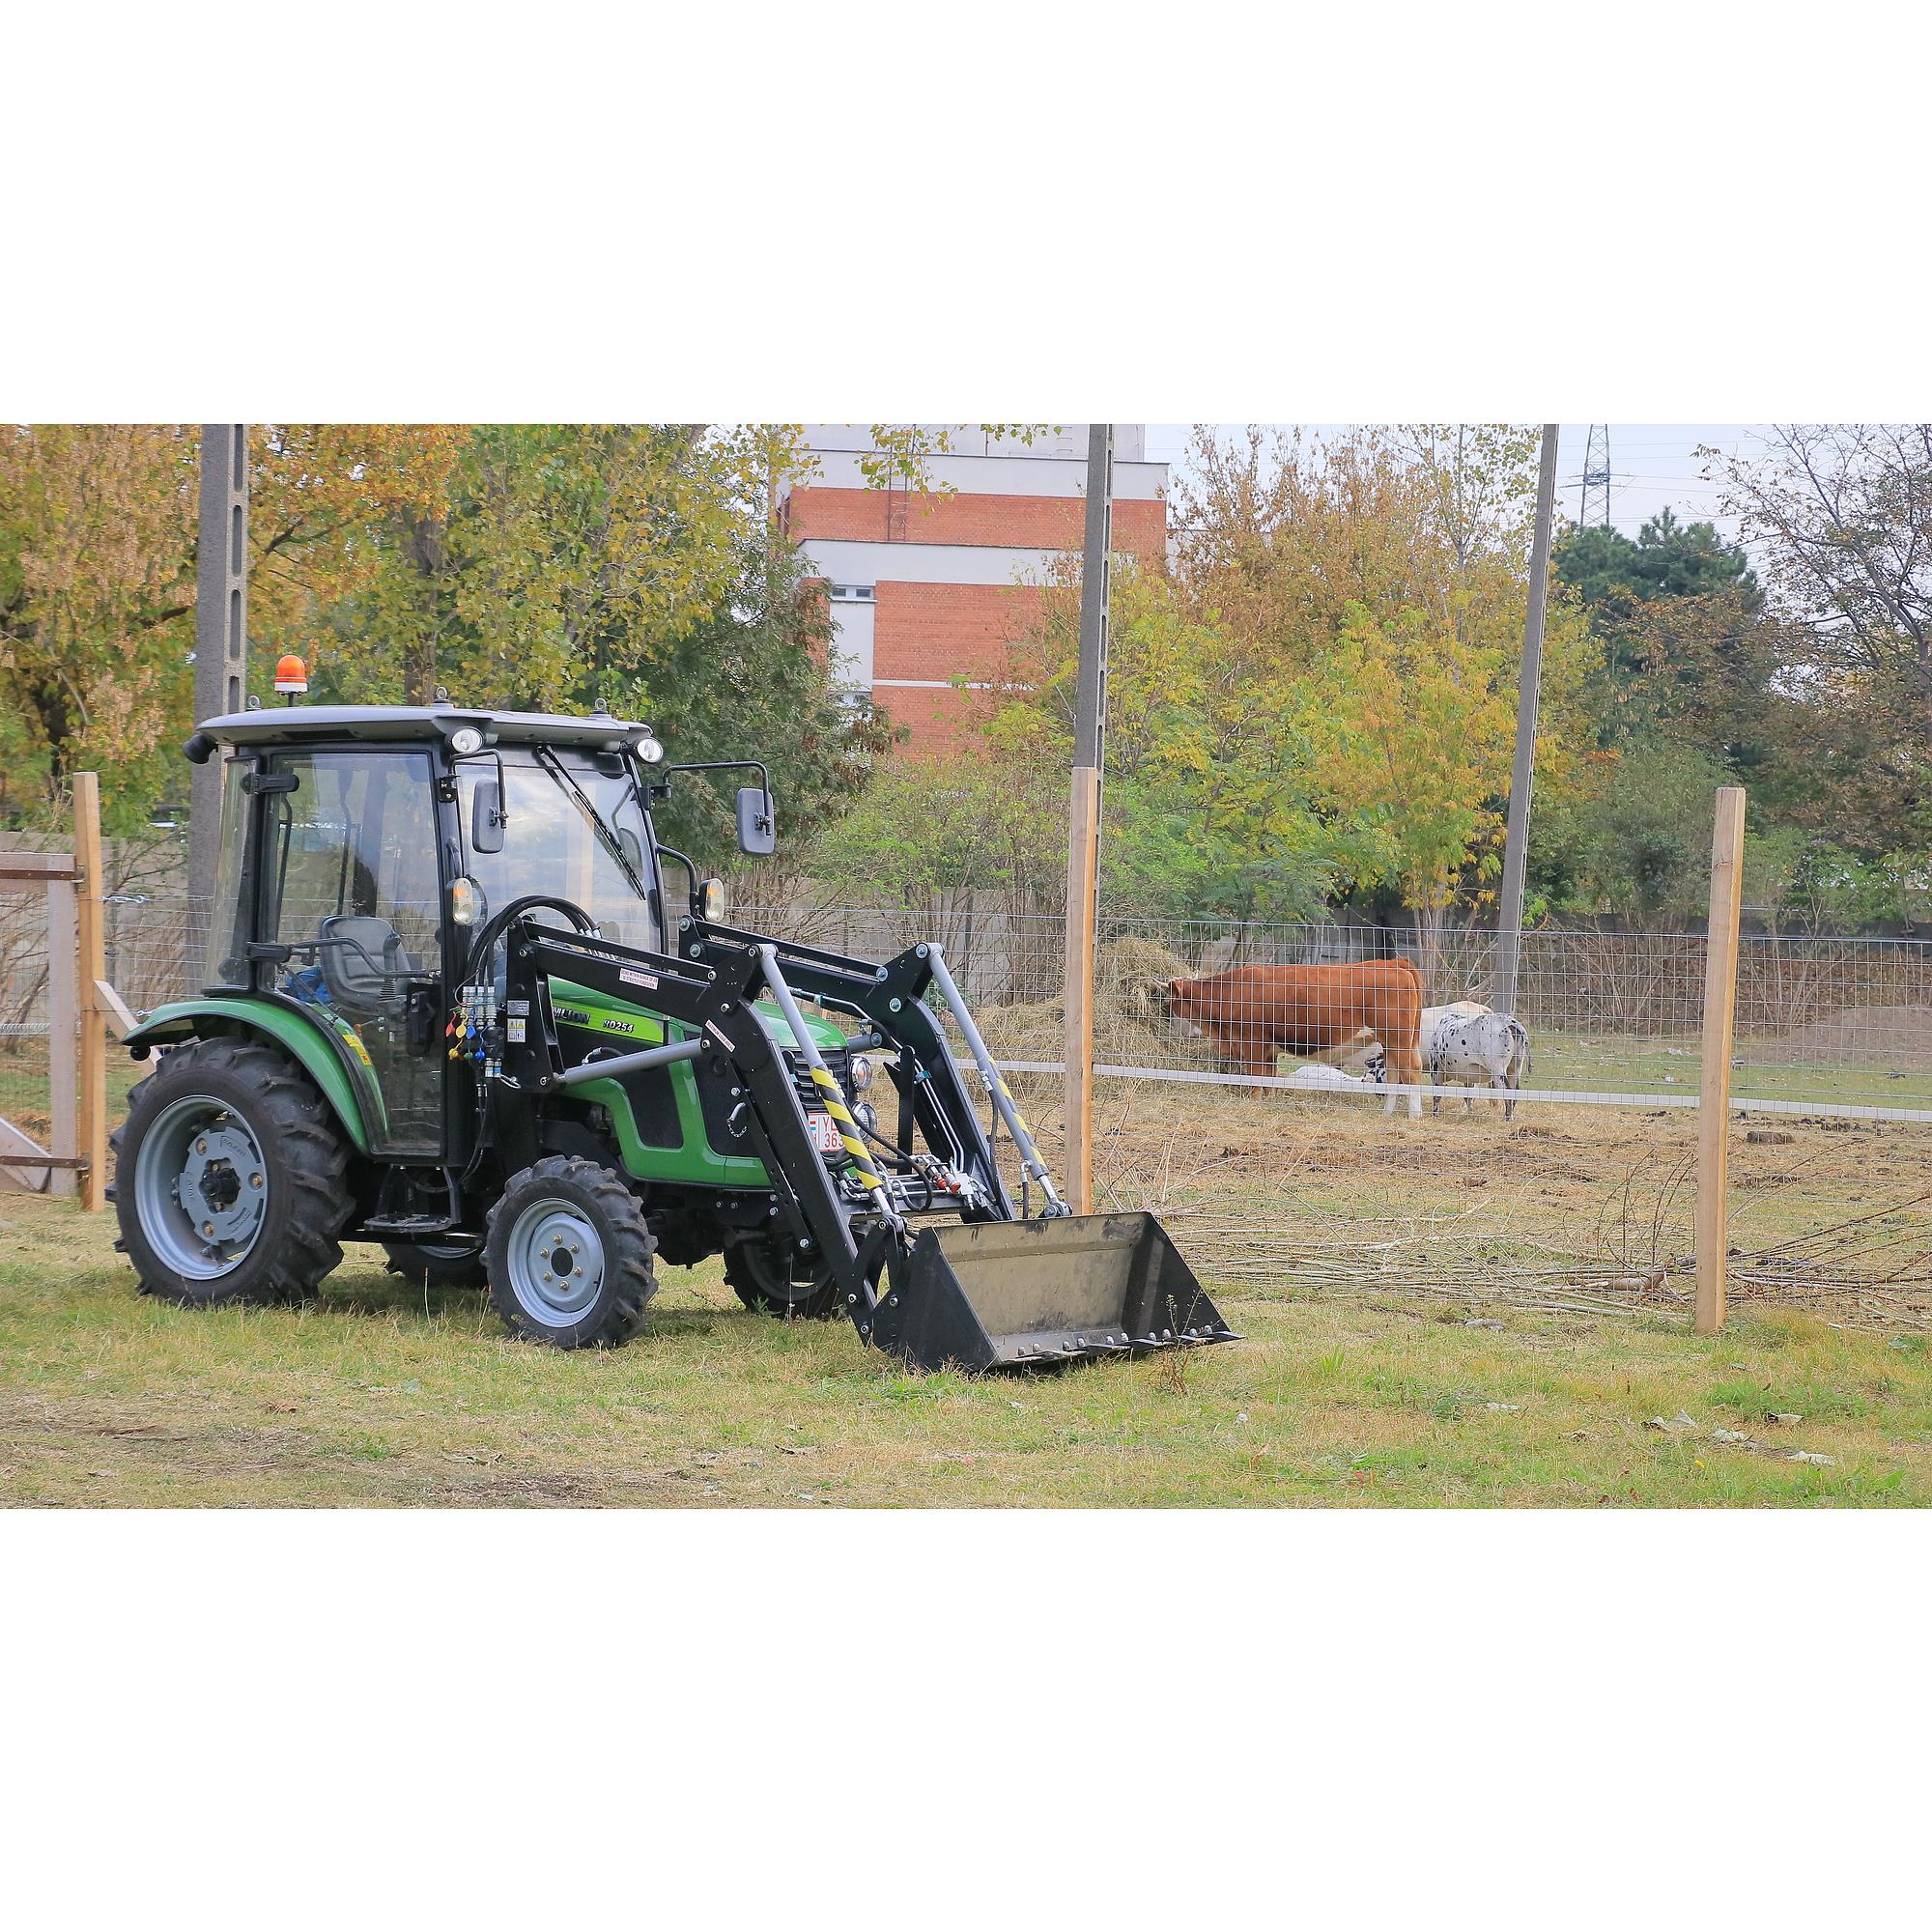 zoomlion-traktor-25-le-fulkes-rd254-13